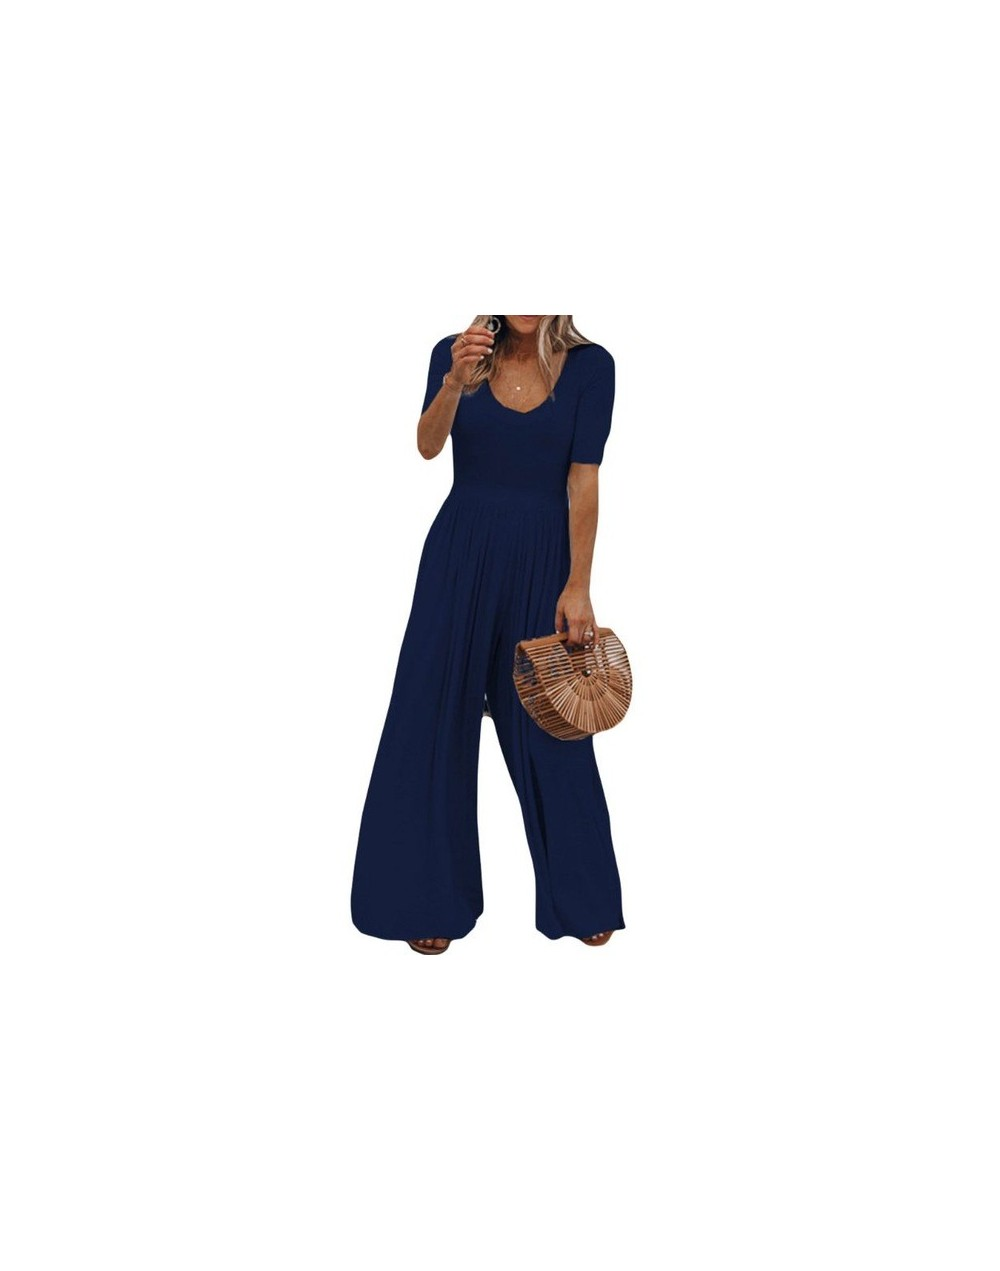 2019 Women Vintage Short Sleeve Jumpsuit Summer O Neck Long Wide Leg Solid Overall Jumpsuits Romper - Blue - 404113036423-2